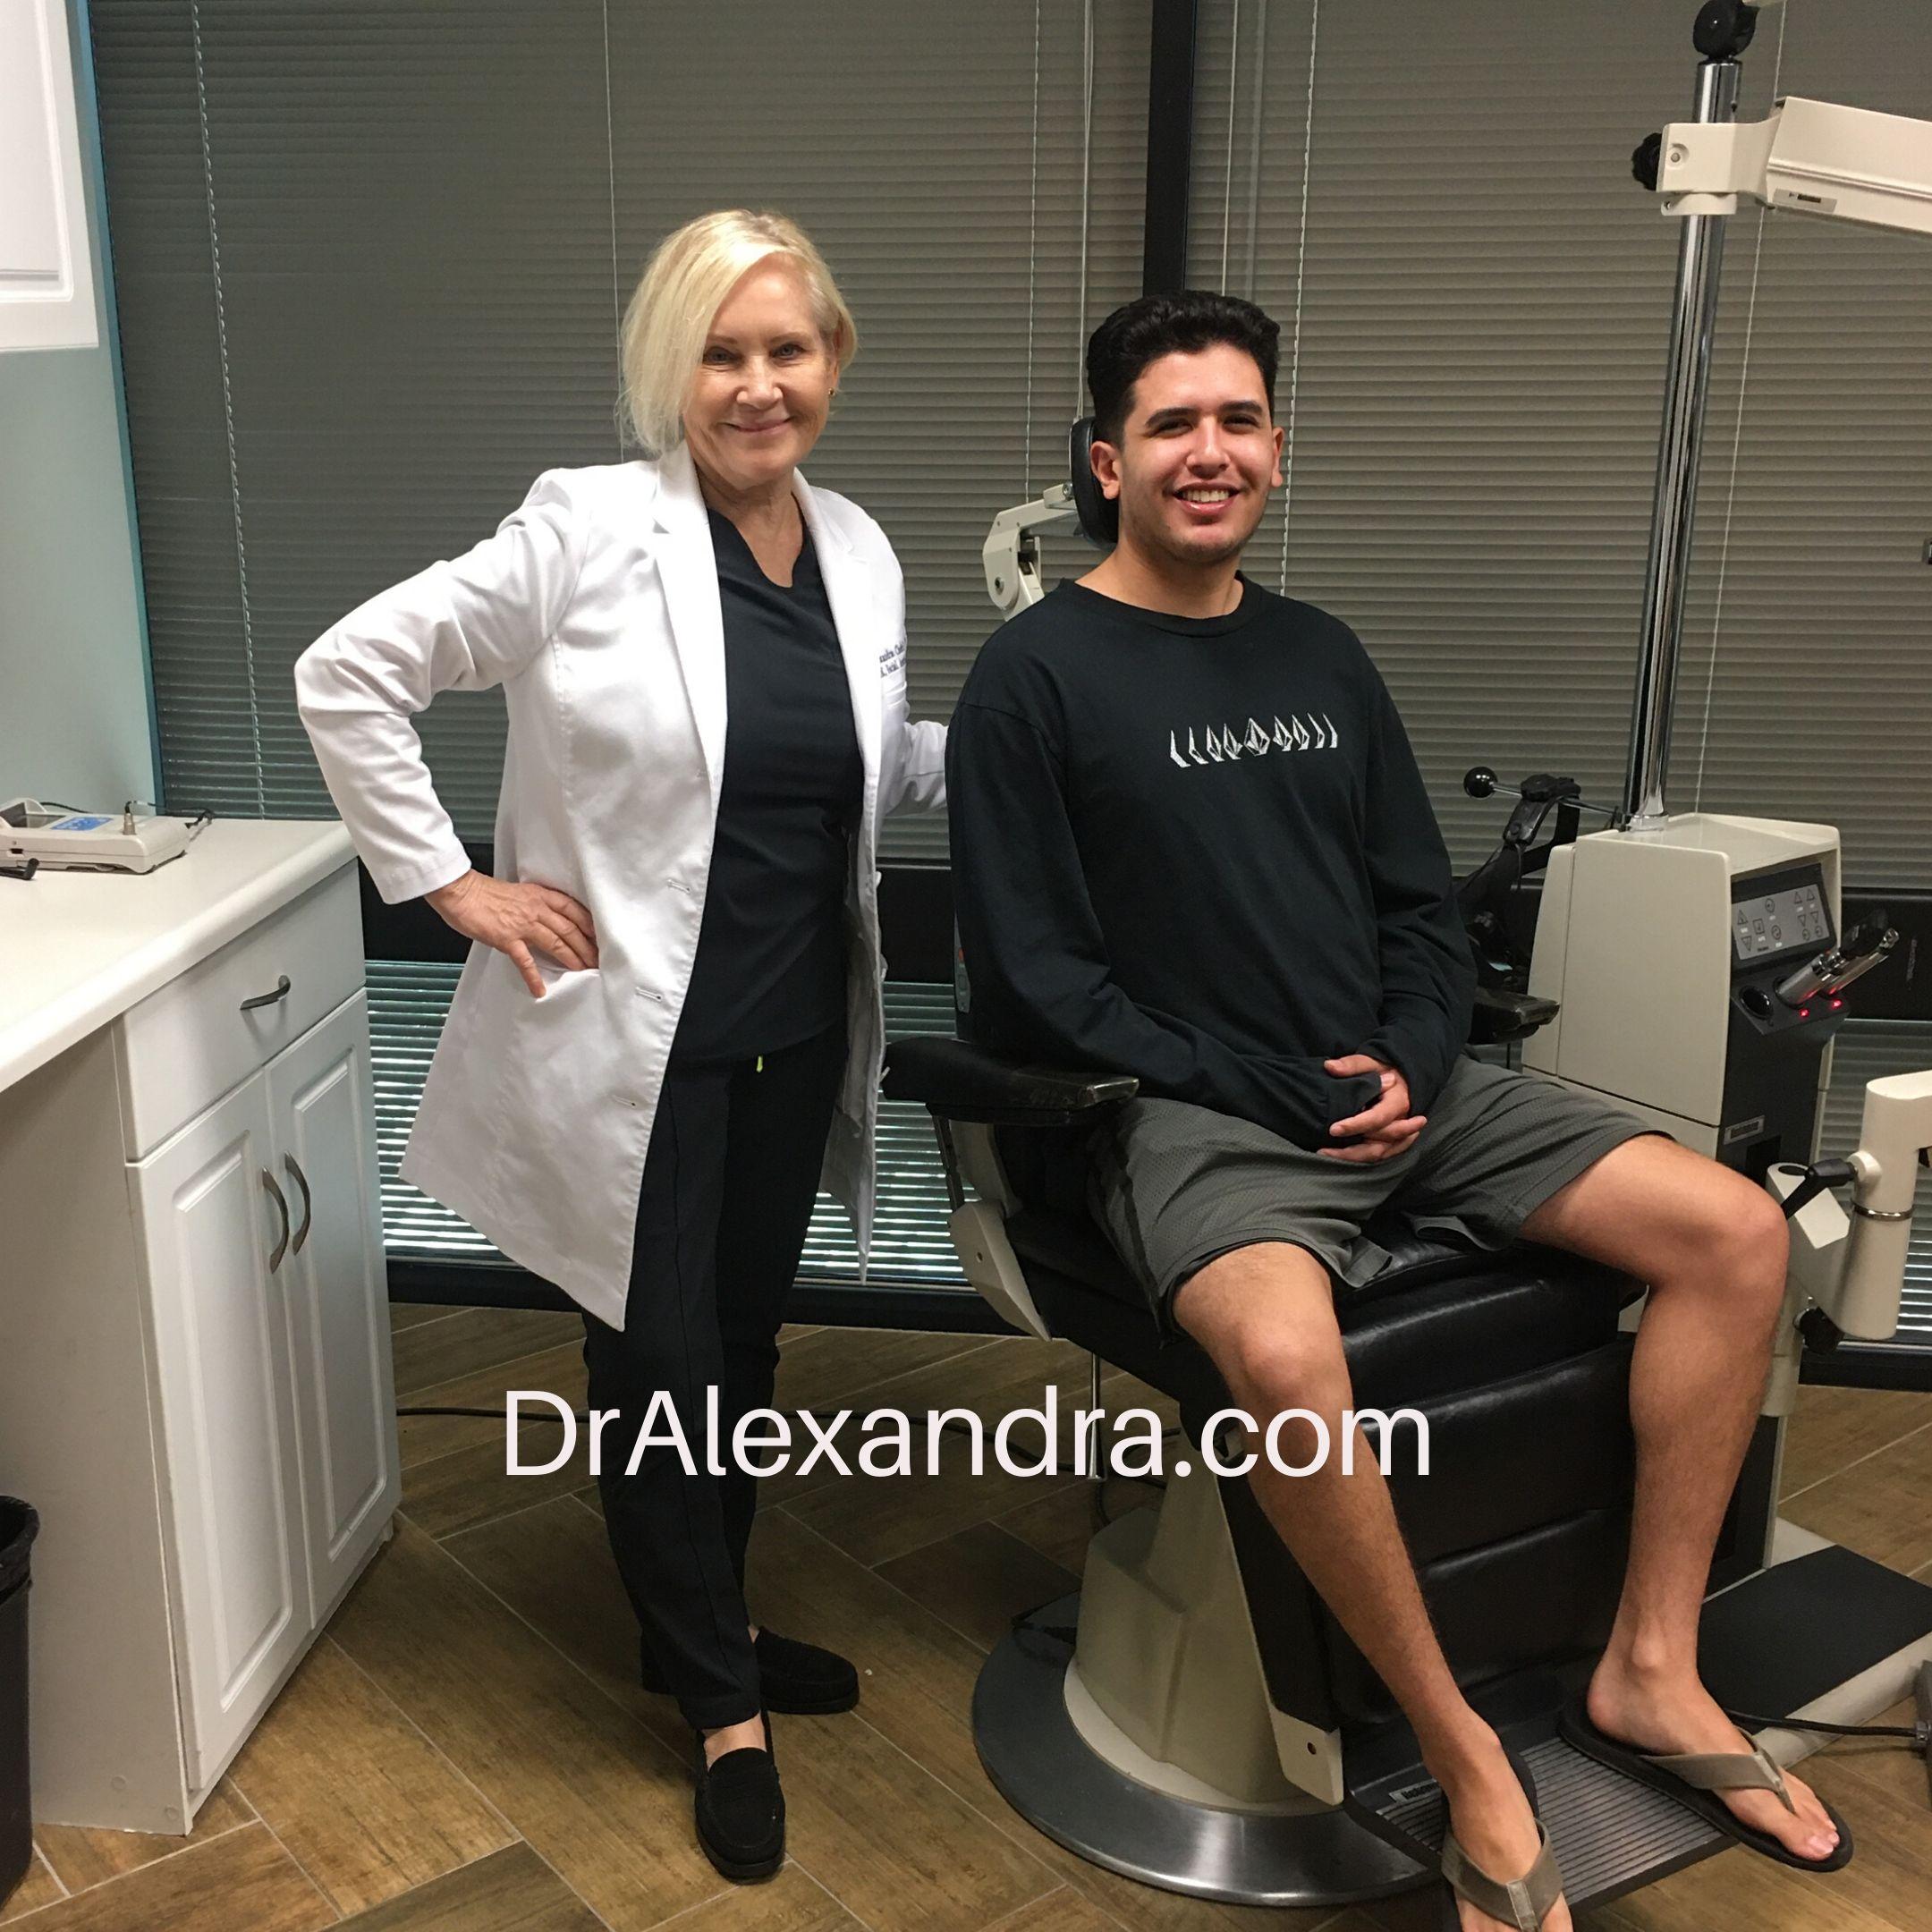 Newport Beach lasik patient with dr alexandra